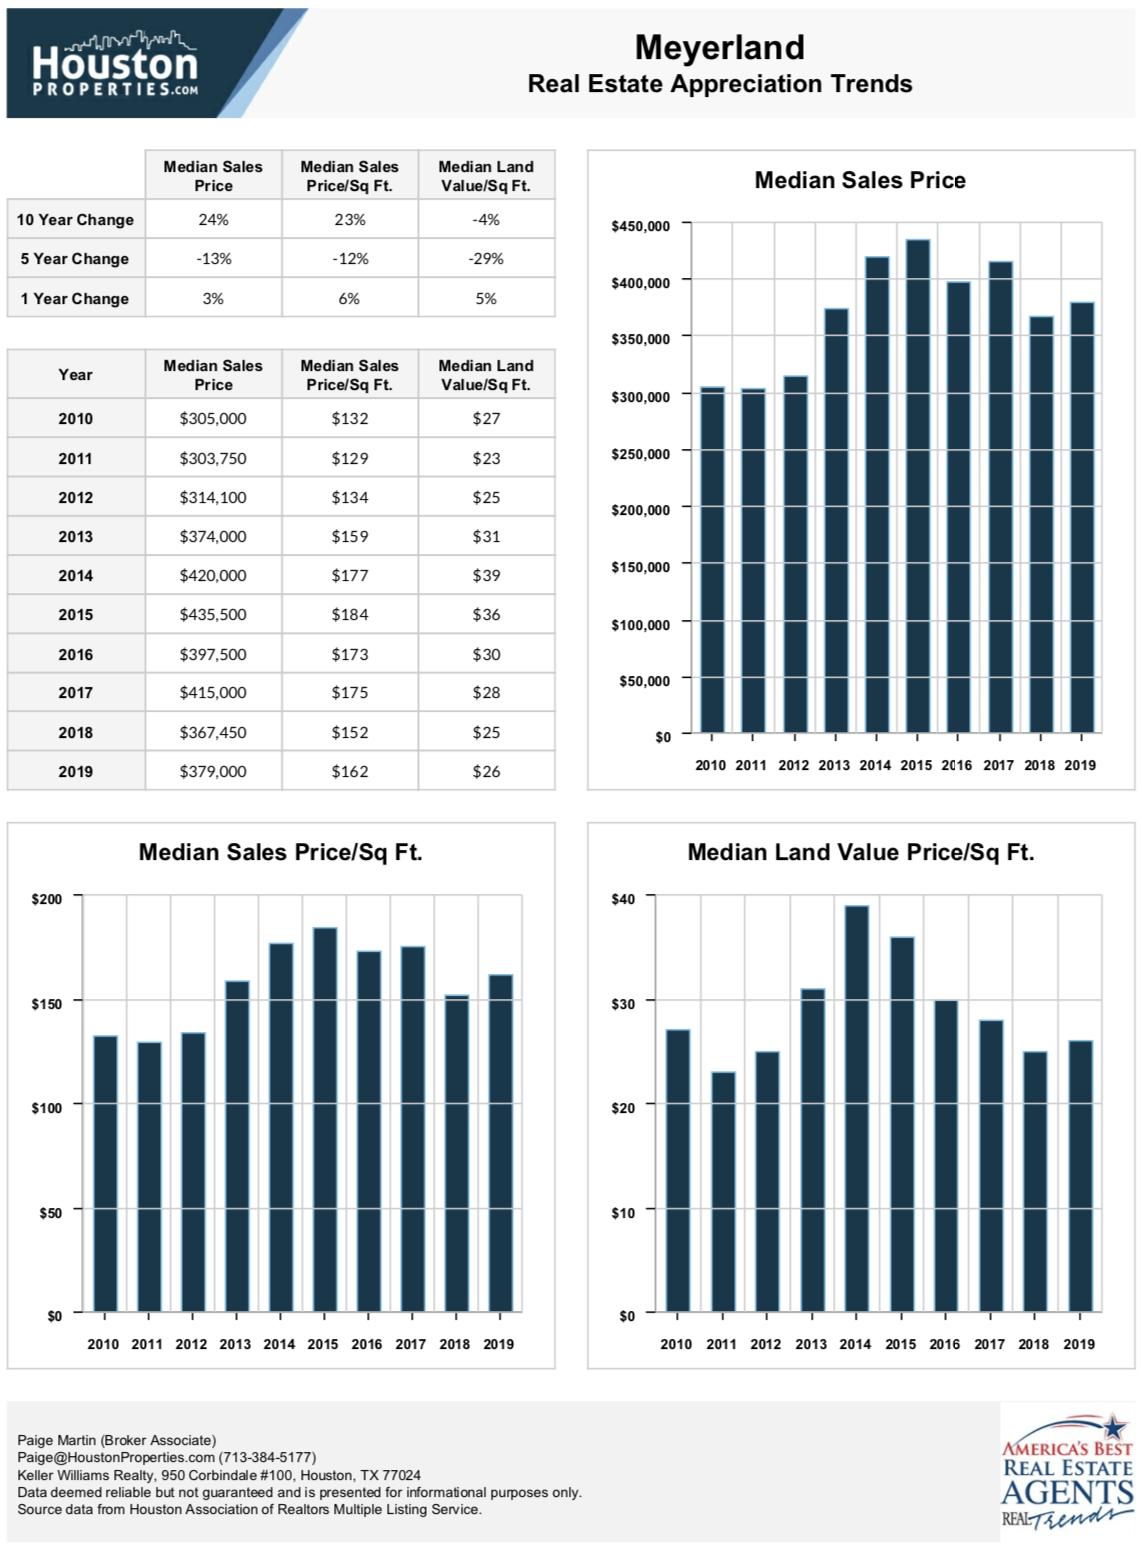 Meyerland Real Estate Appreciation Trends